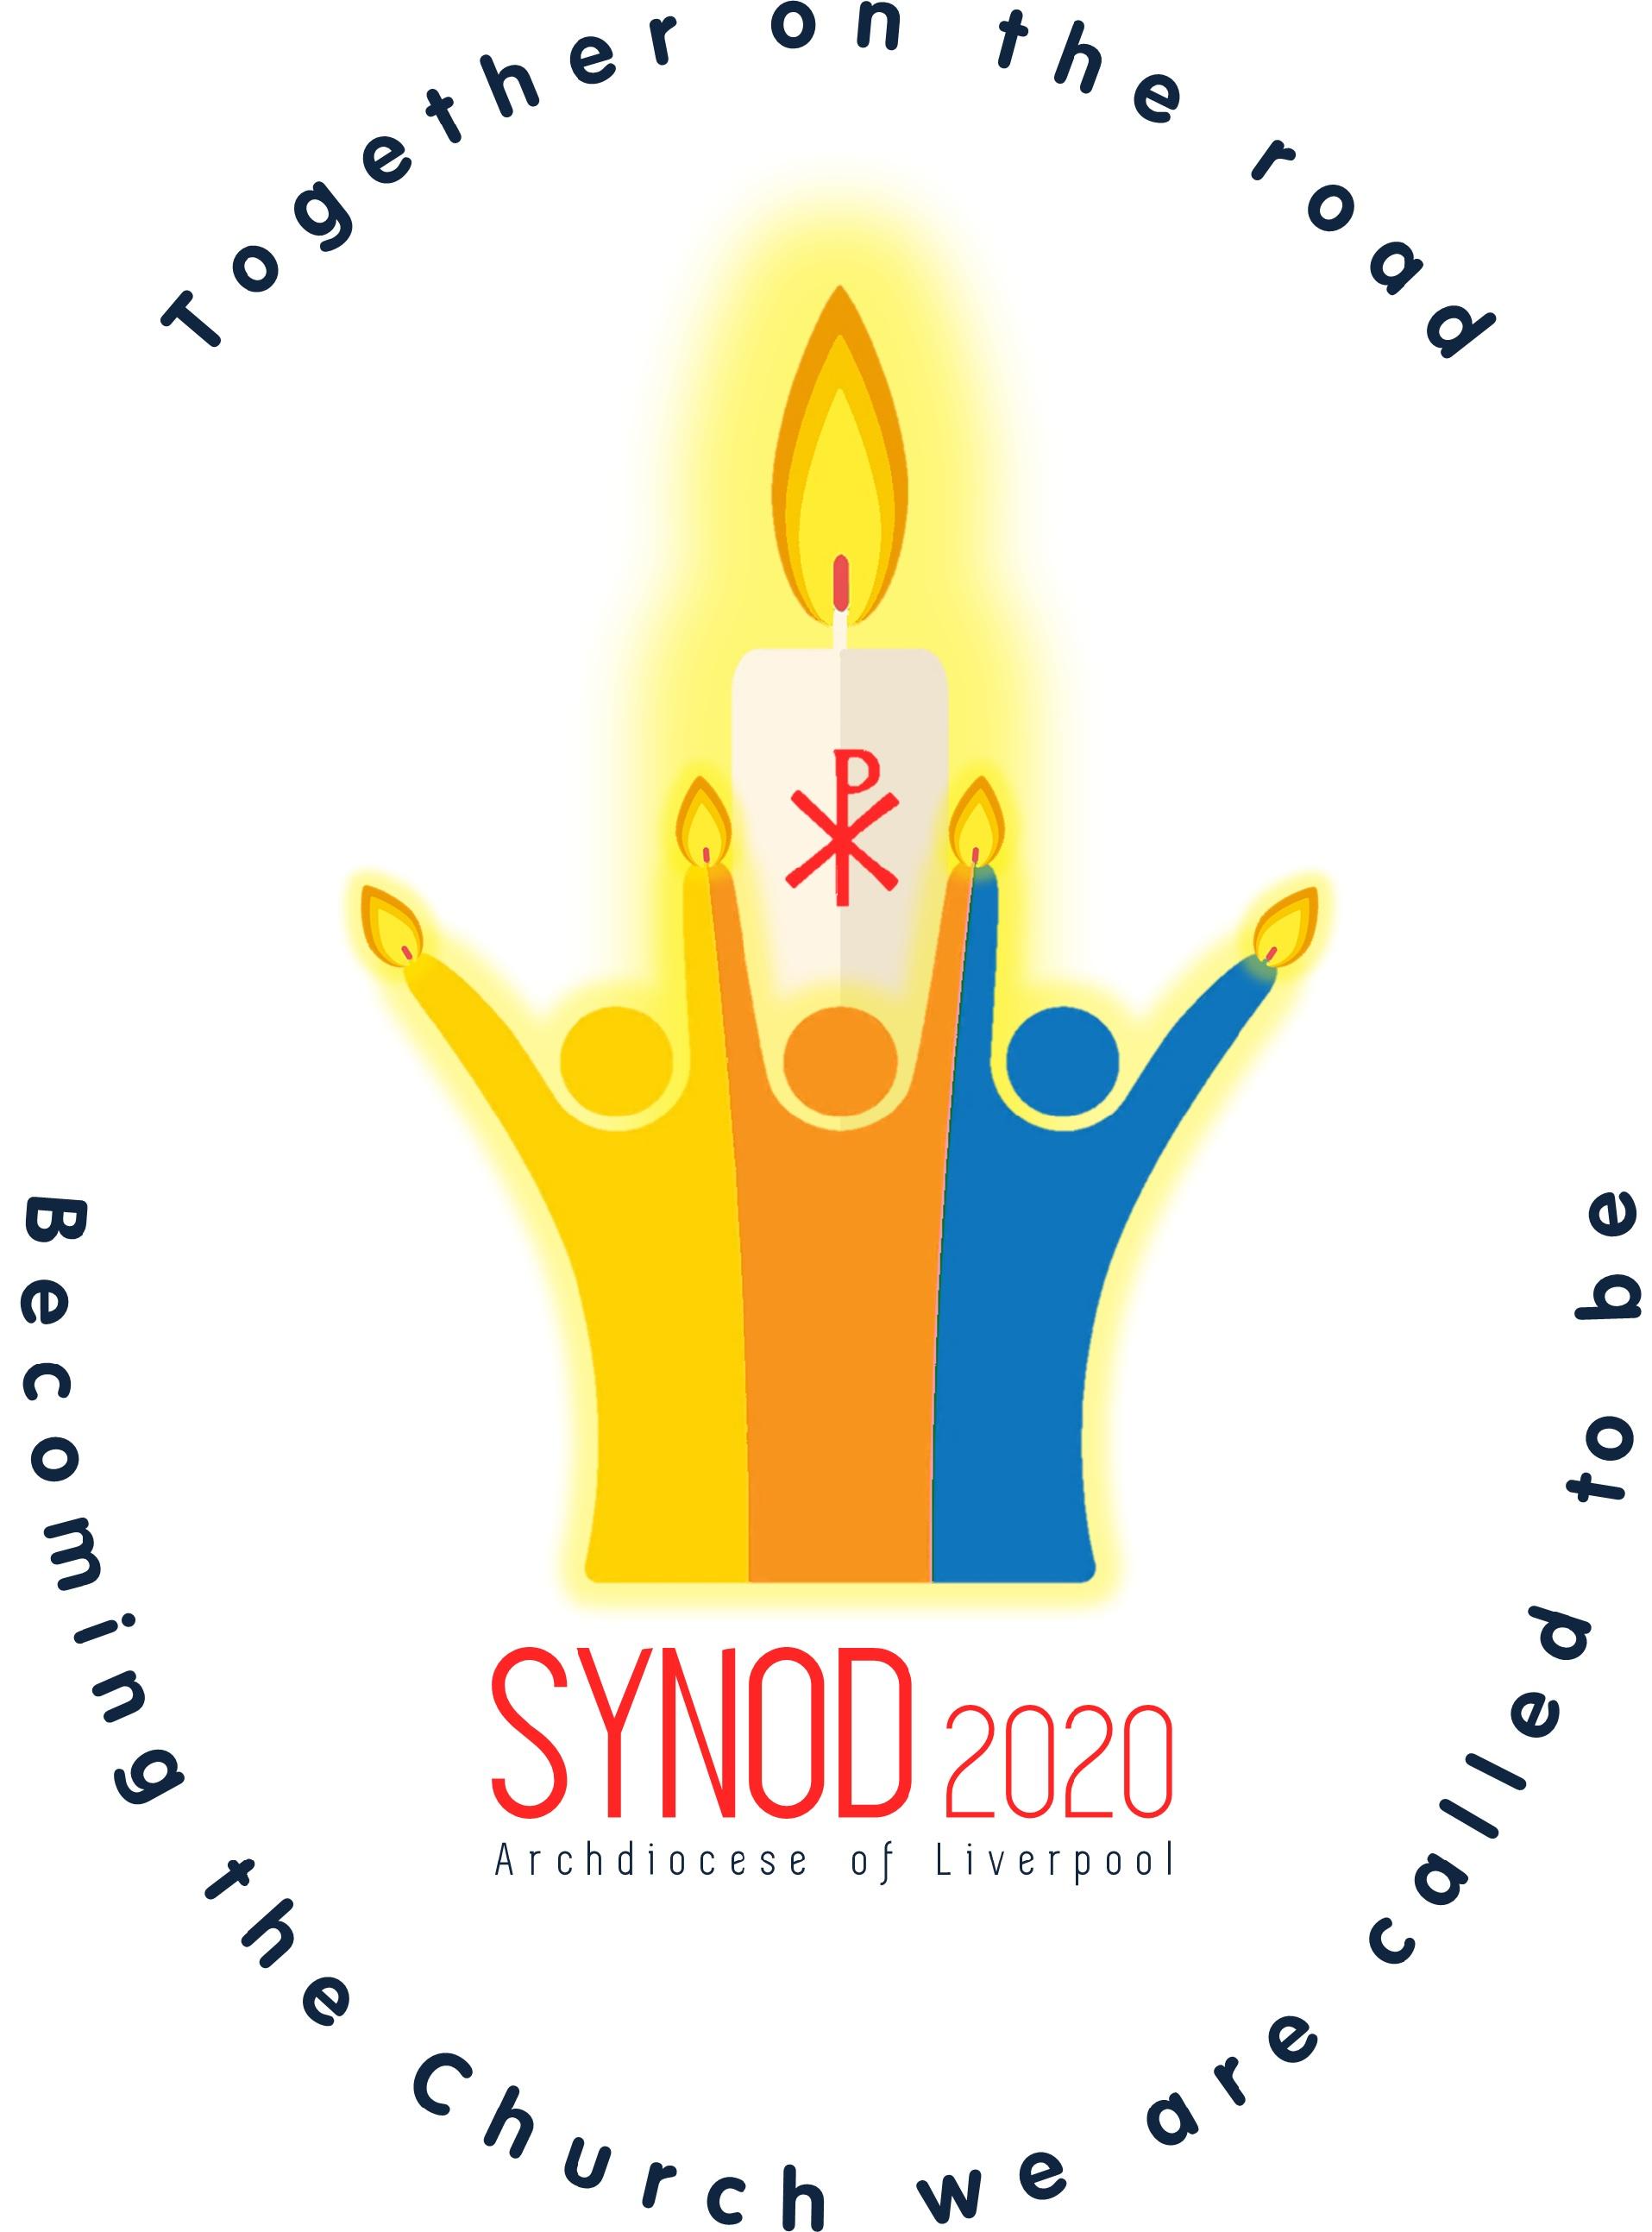 5bb32483306e7-Synod2020-Large